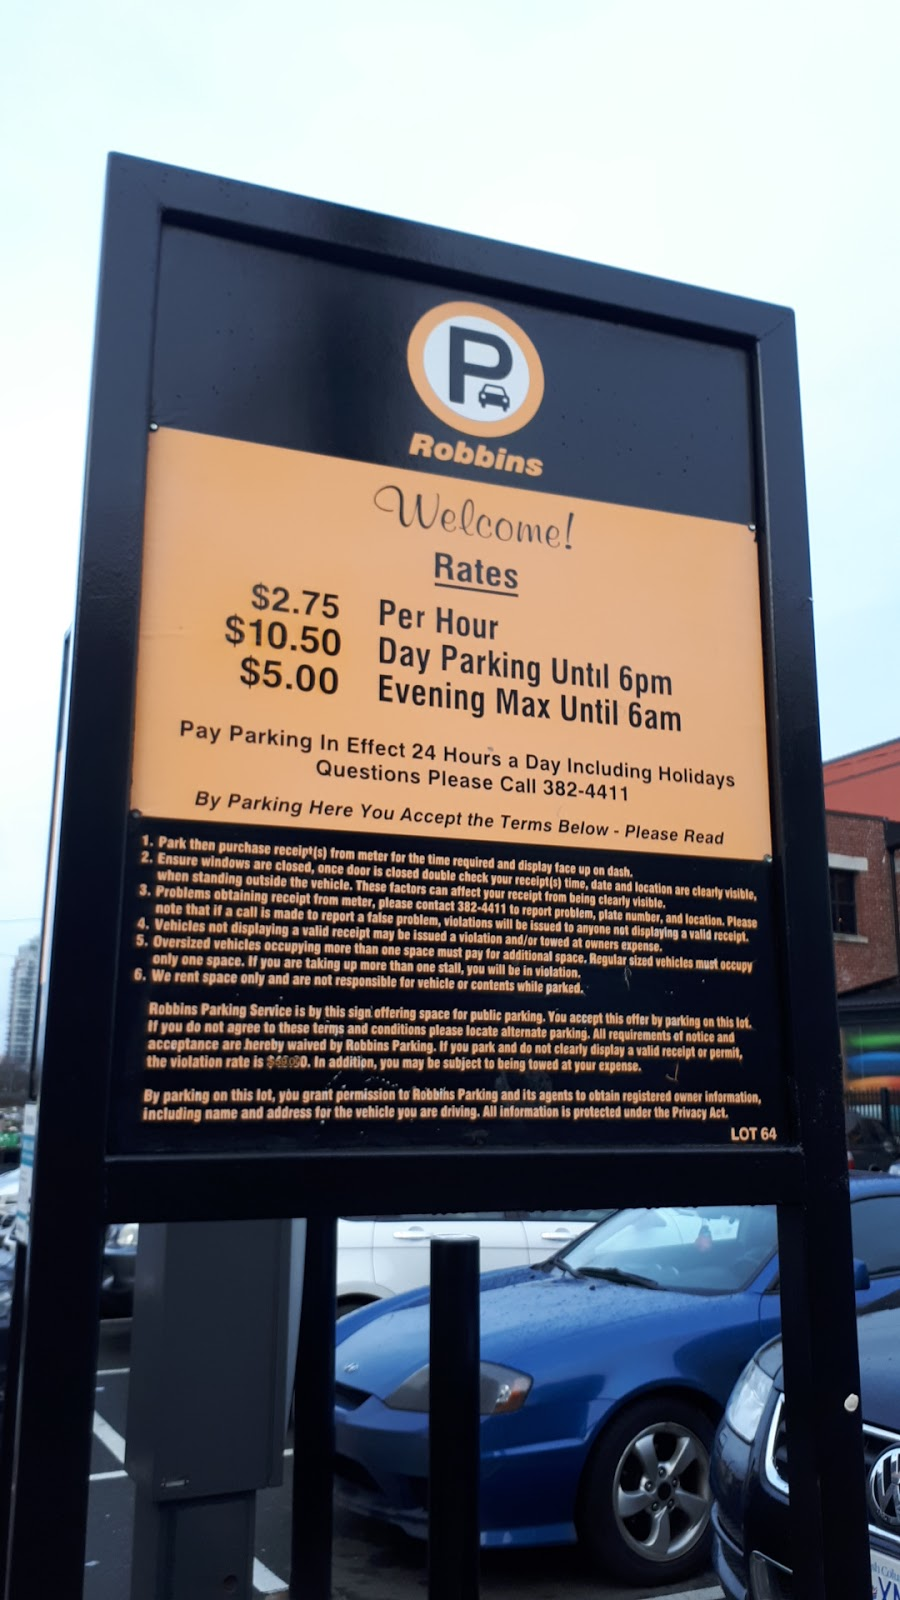 1610-1612 Store St Parking | parking | 1610-1612 Store St, Victoria, BC V8W 1V3, Canada